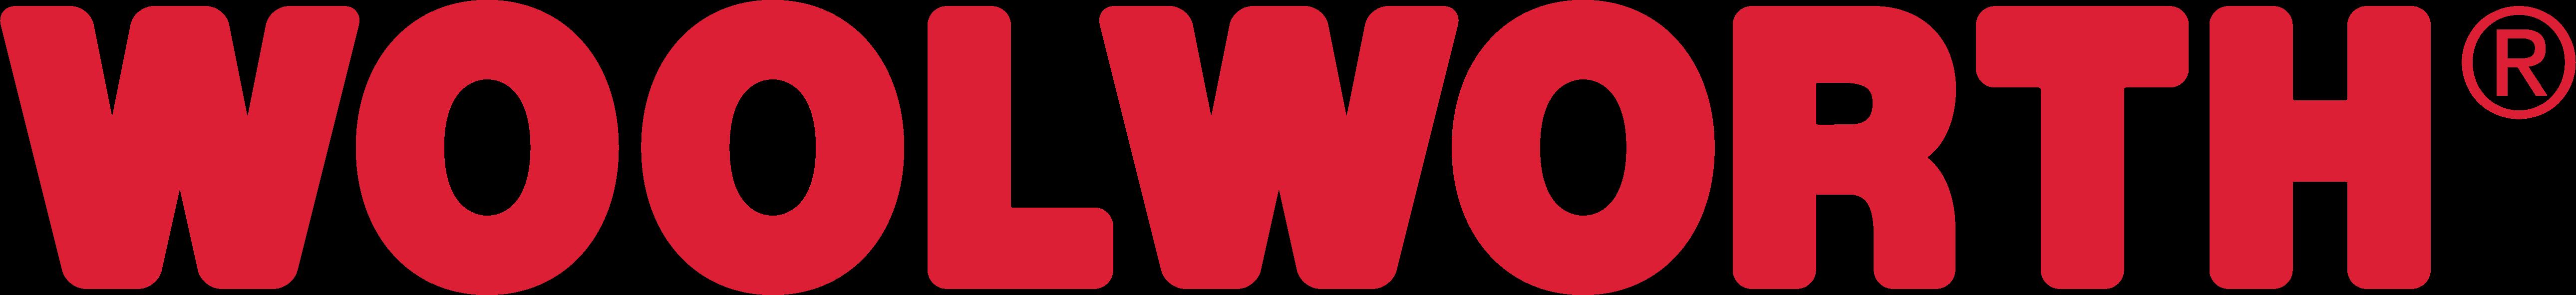 woolworth-gmbh_logo